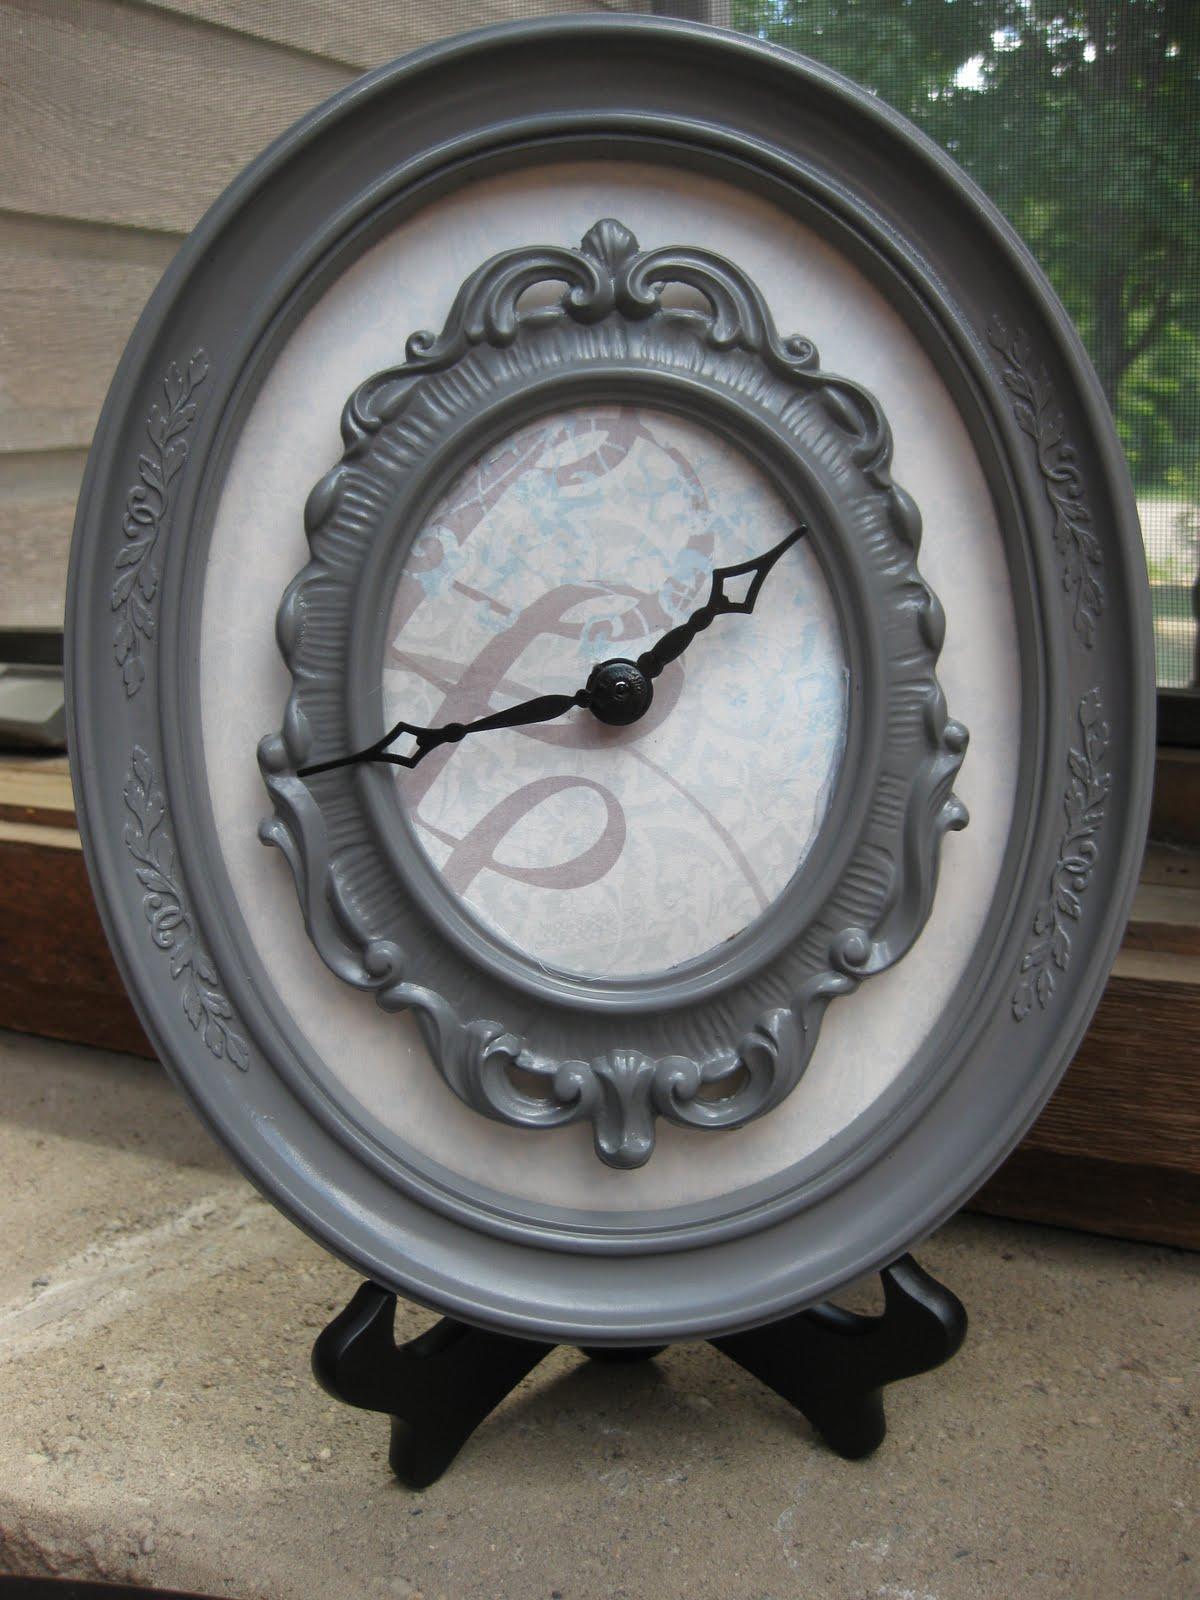 Remodelaholic 25 Cool Diy Clocks